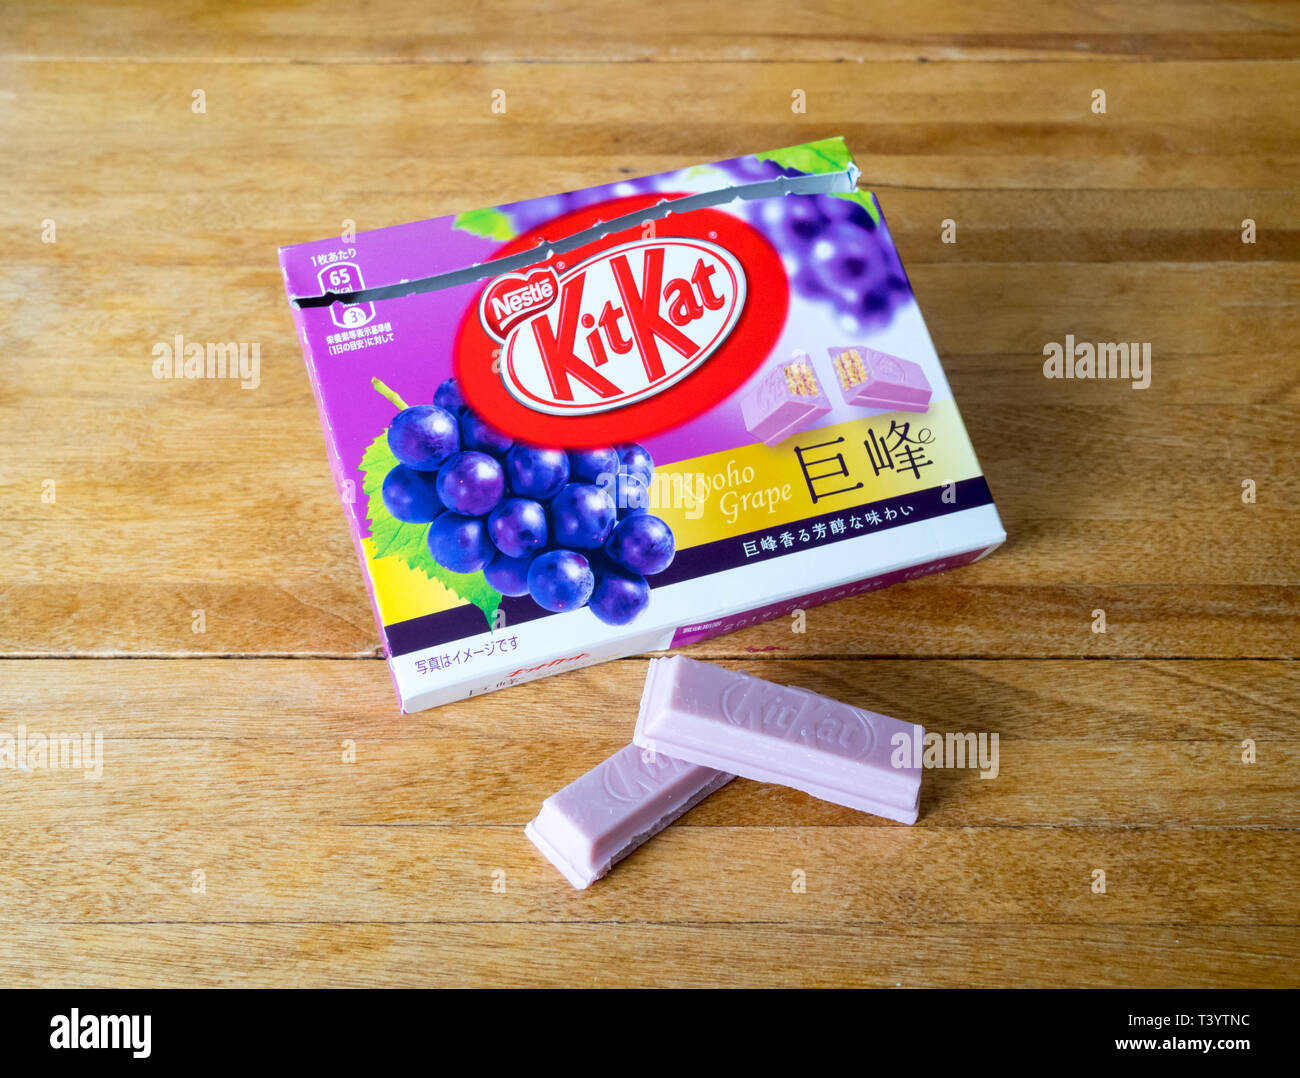 A Japanese Kyoho Grape Kit Kat chocolate bar. - Stock Image